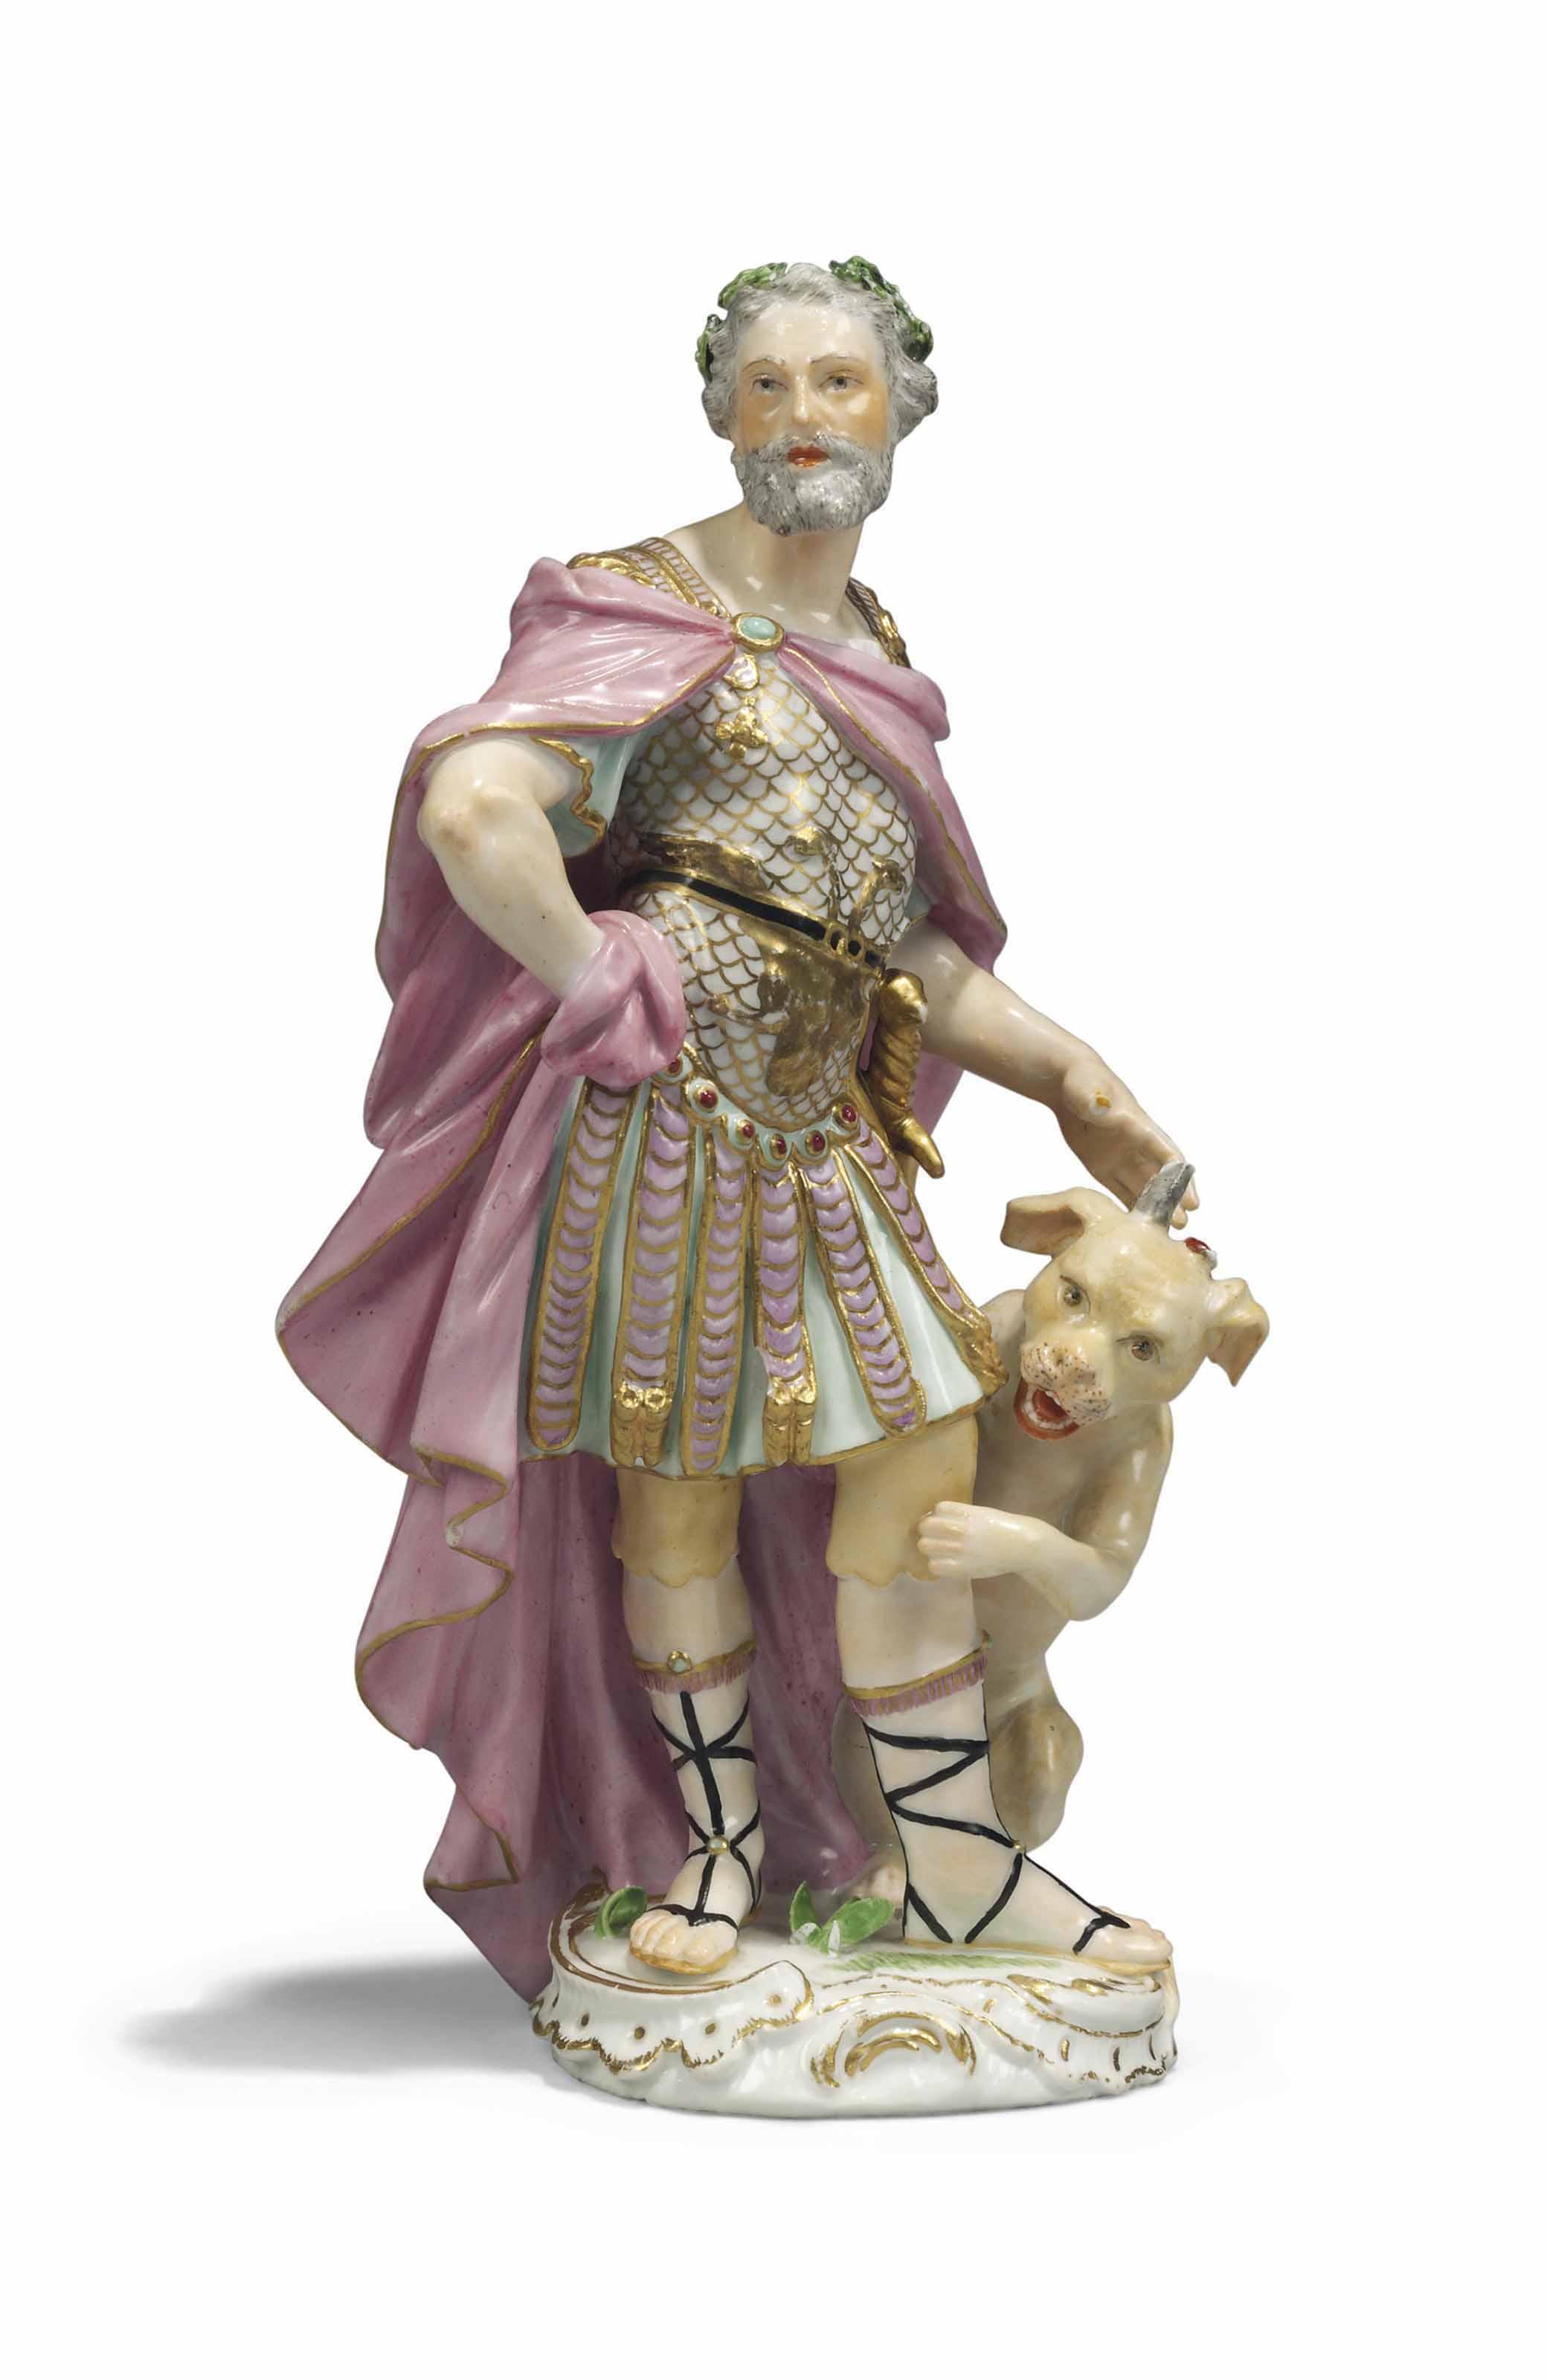 A MEISSEN FIGURE OF JULIUS CAE